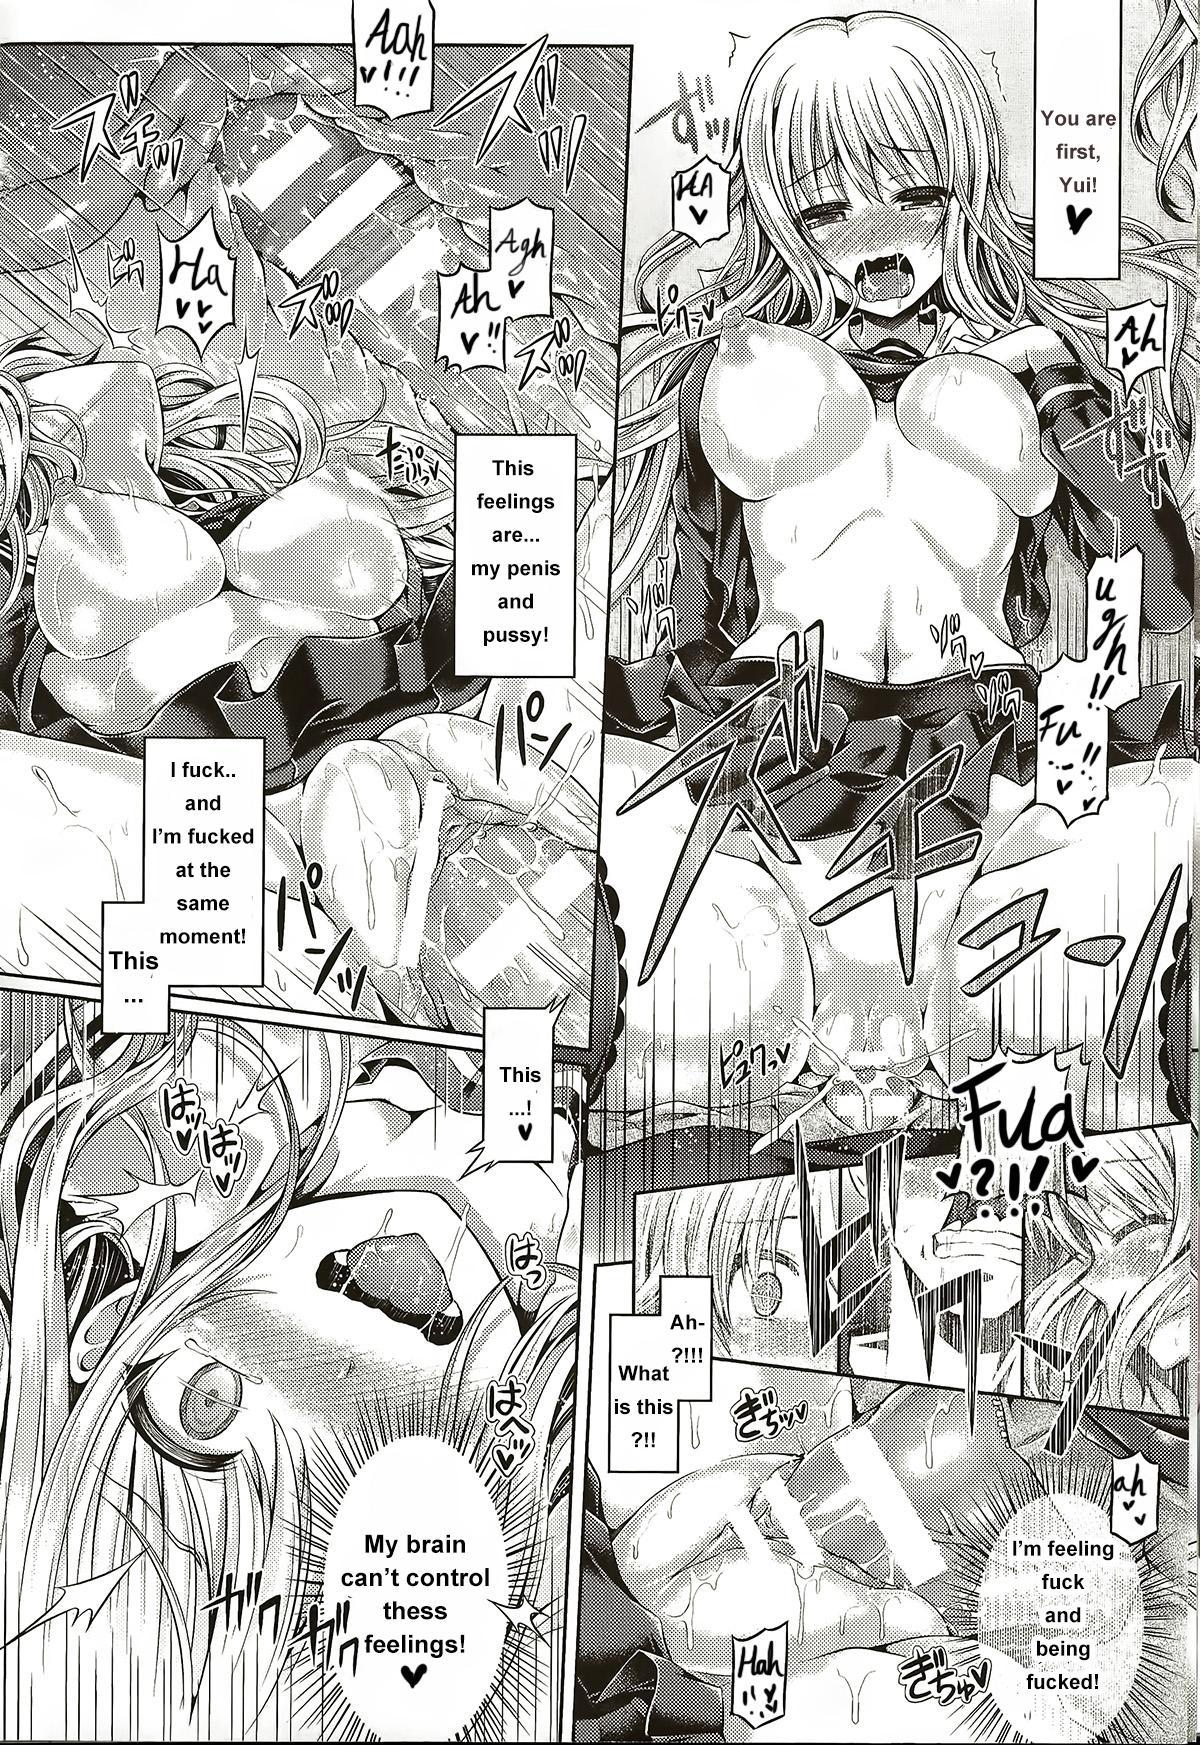 INSERT LEVEL 5: Danjo Kousaku Ecstasy 3